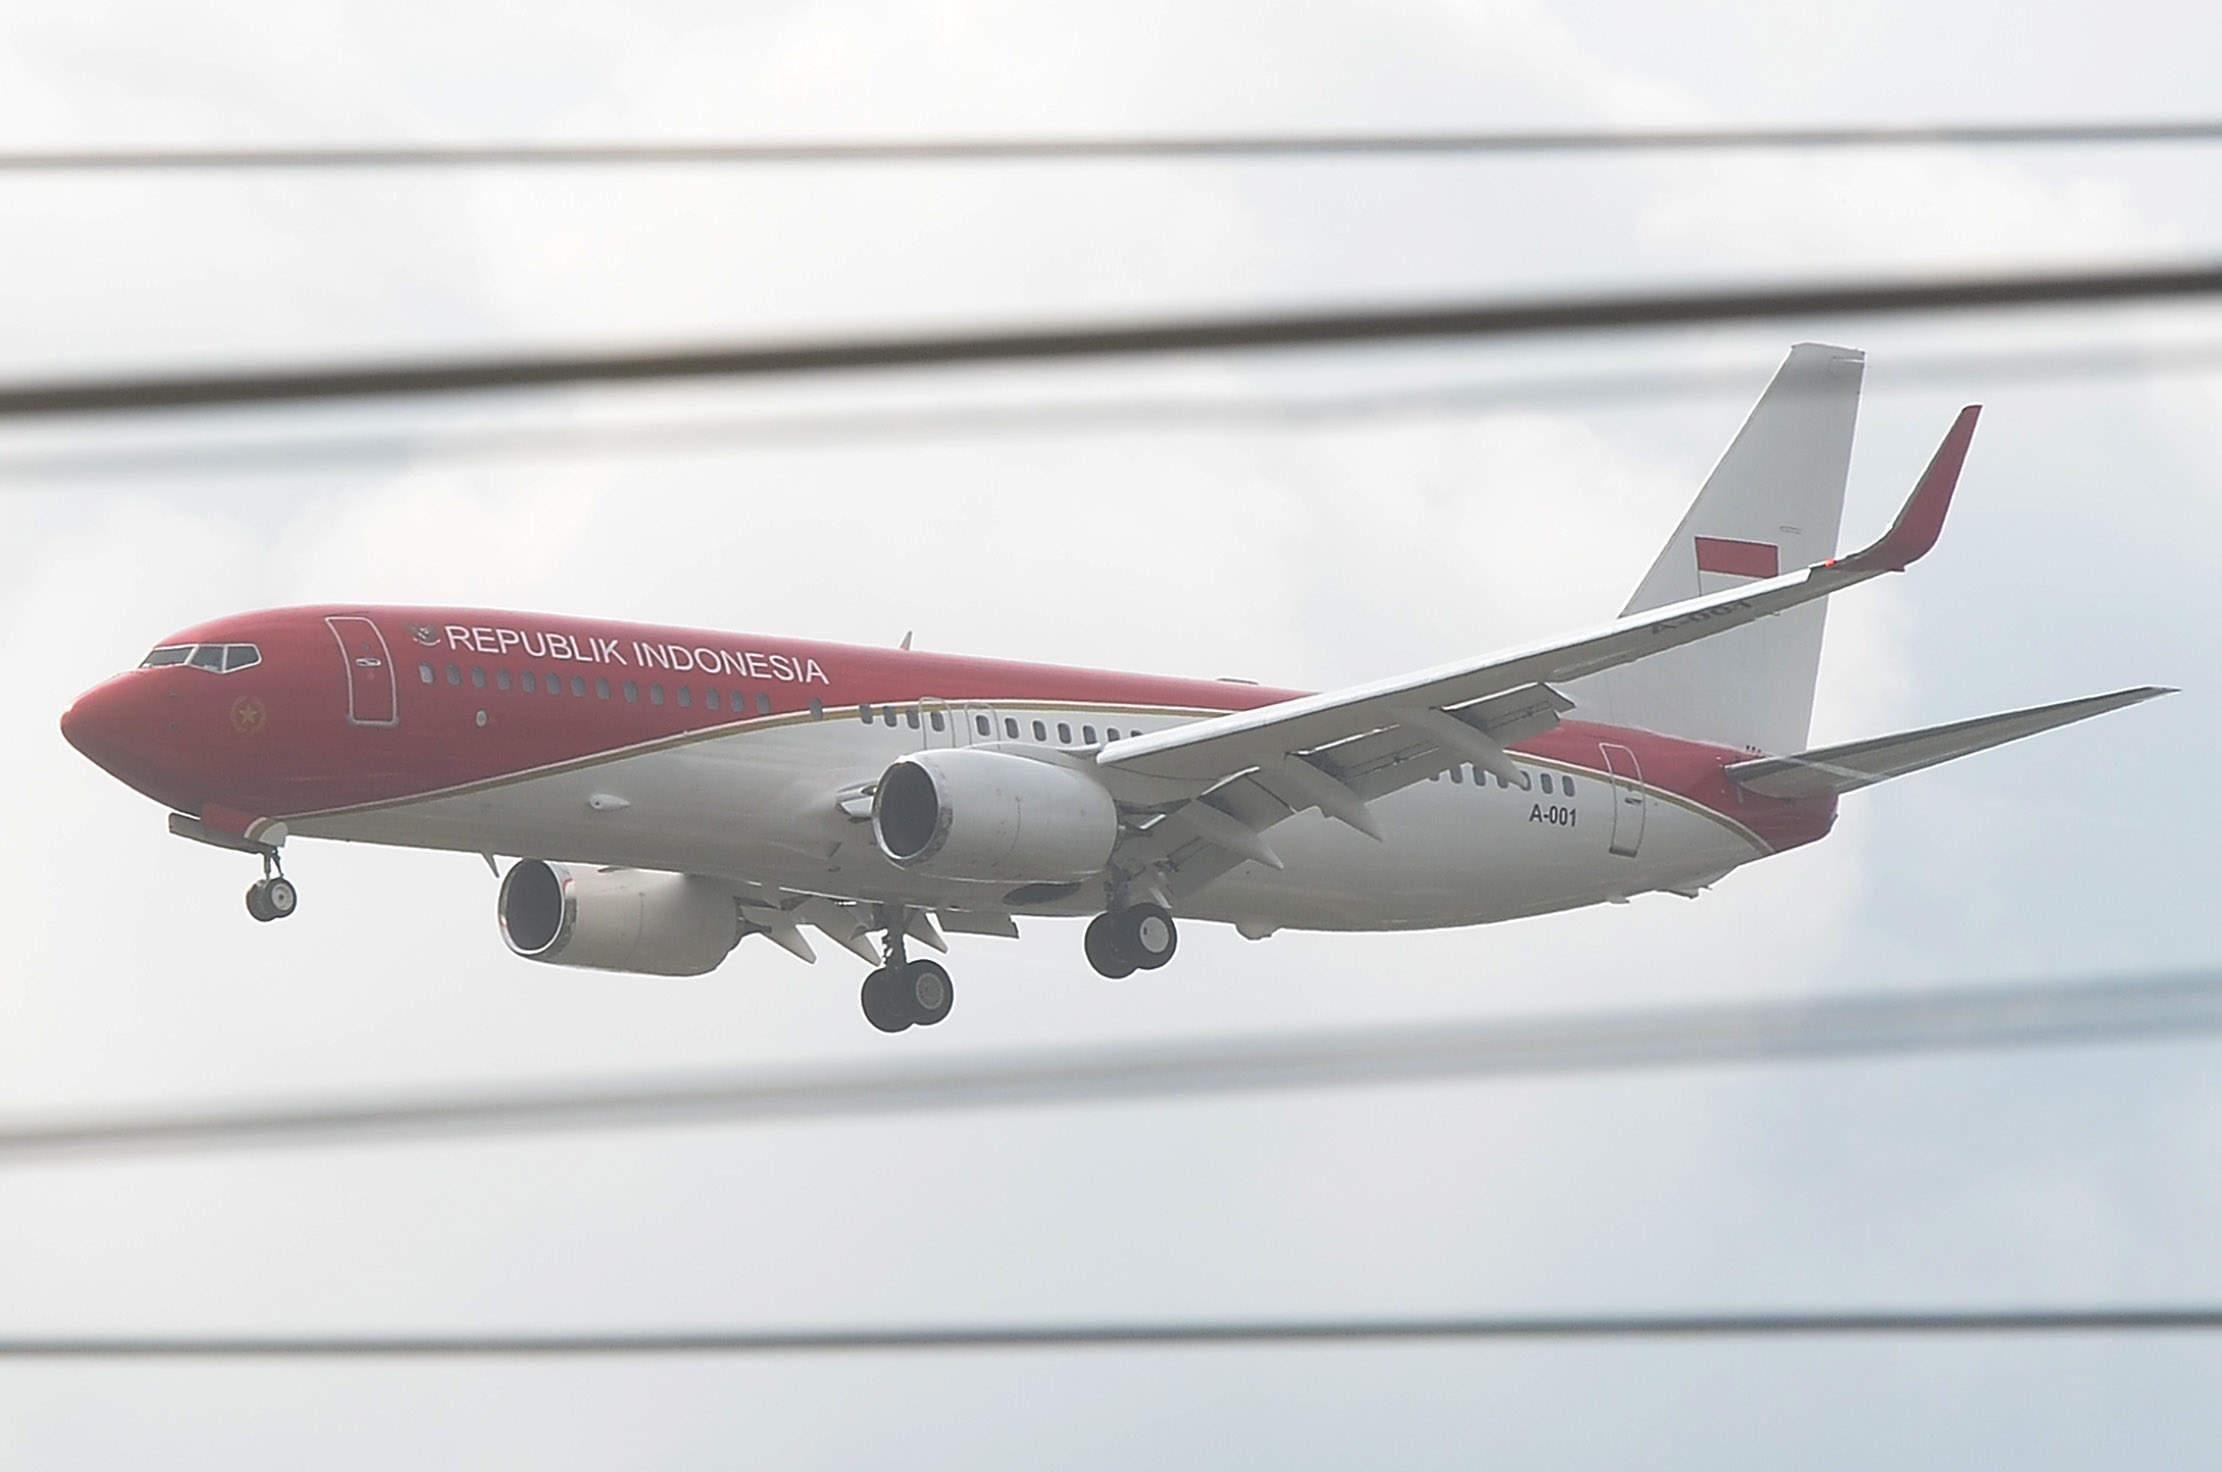 Setelah Mendarat, Presiden Jokowi ke Bengkalis Naik Heli